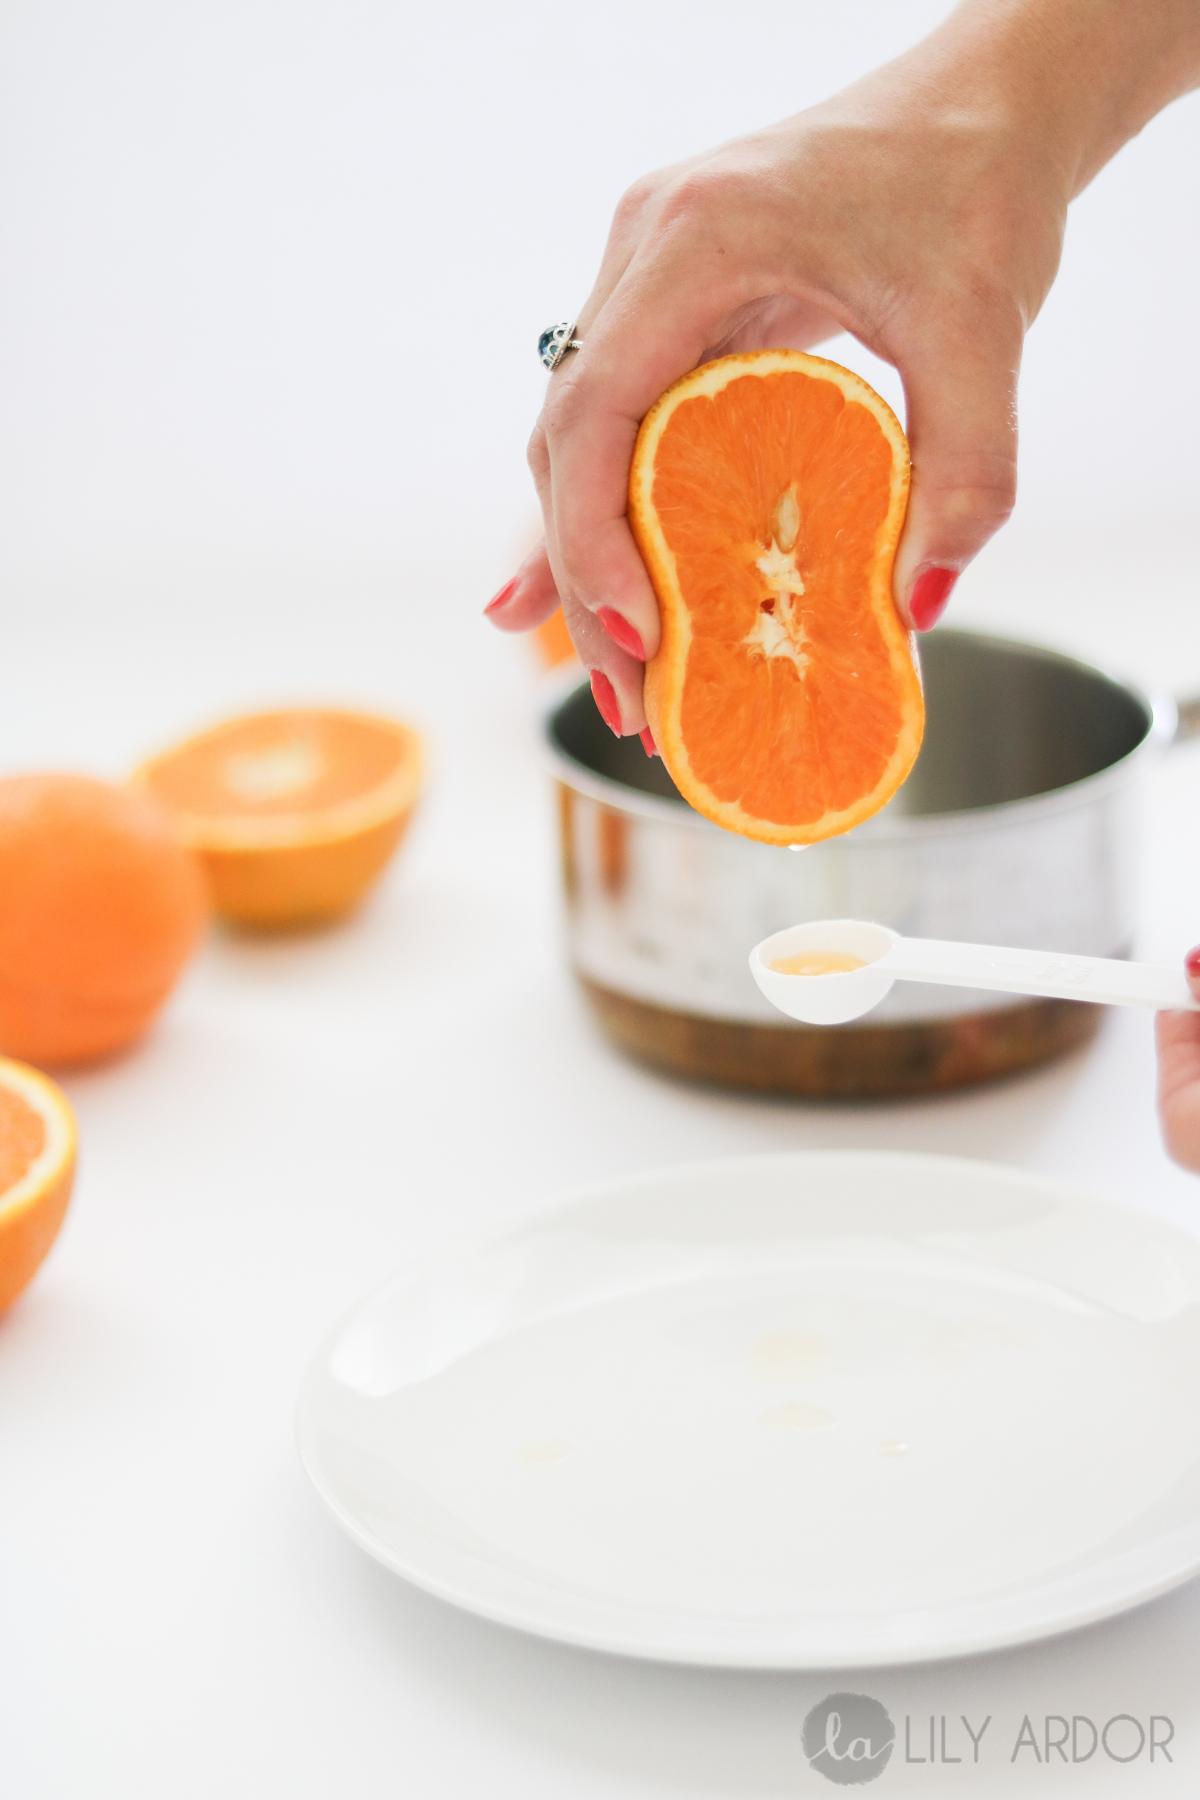 diy lip balm- orange marmalade lip salve | lily ardor